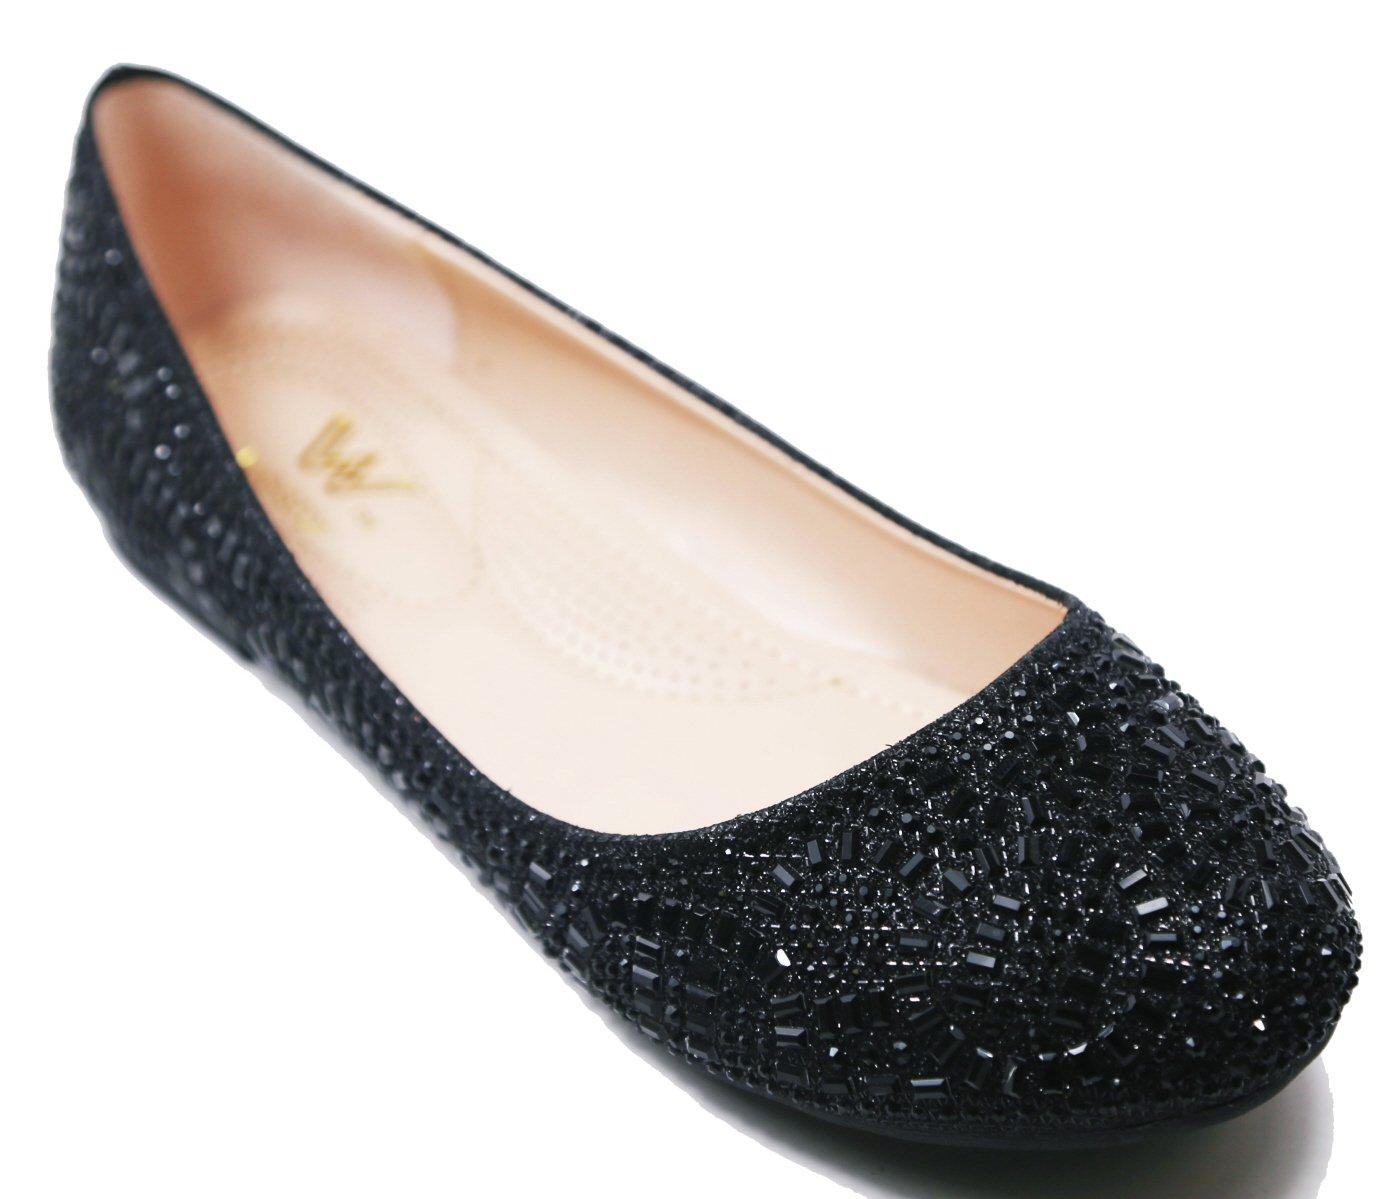 Walstar Women Rhinestone Flats Glitter Mesh Flats Slip on Shoes B071HFHCPS 7.5 B(M) US|Rhinestone-black